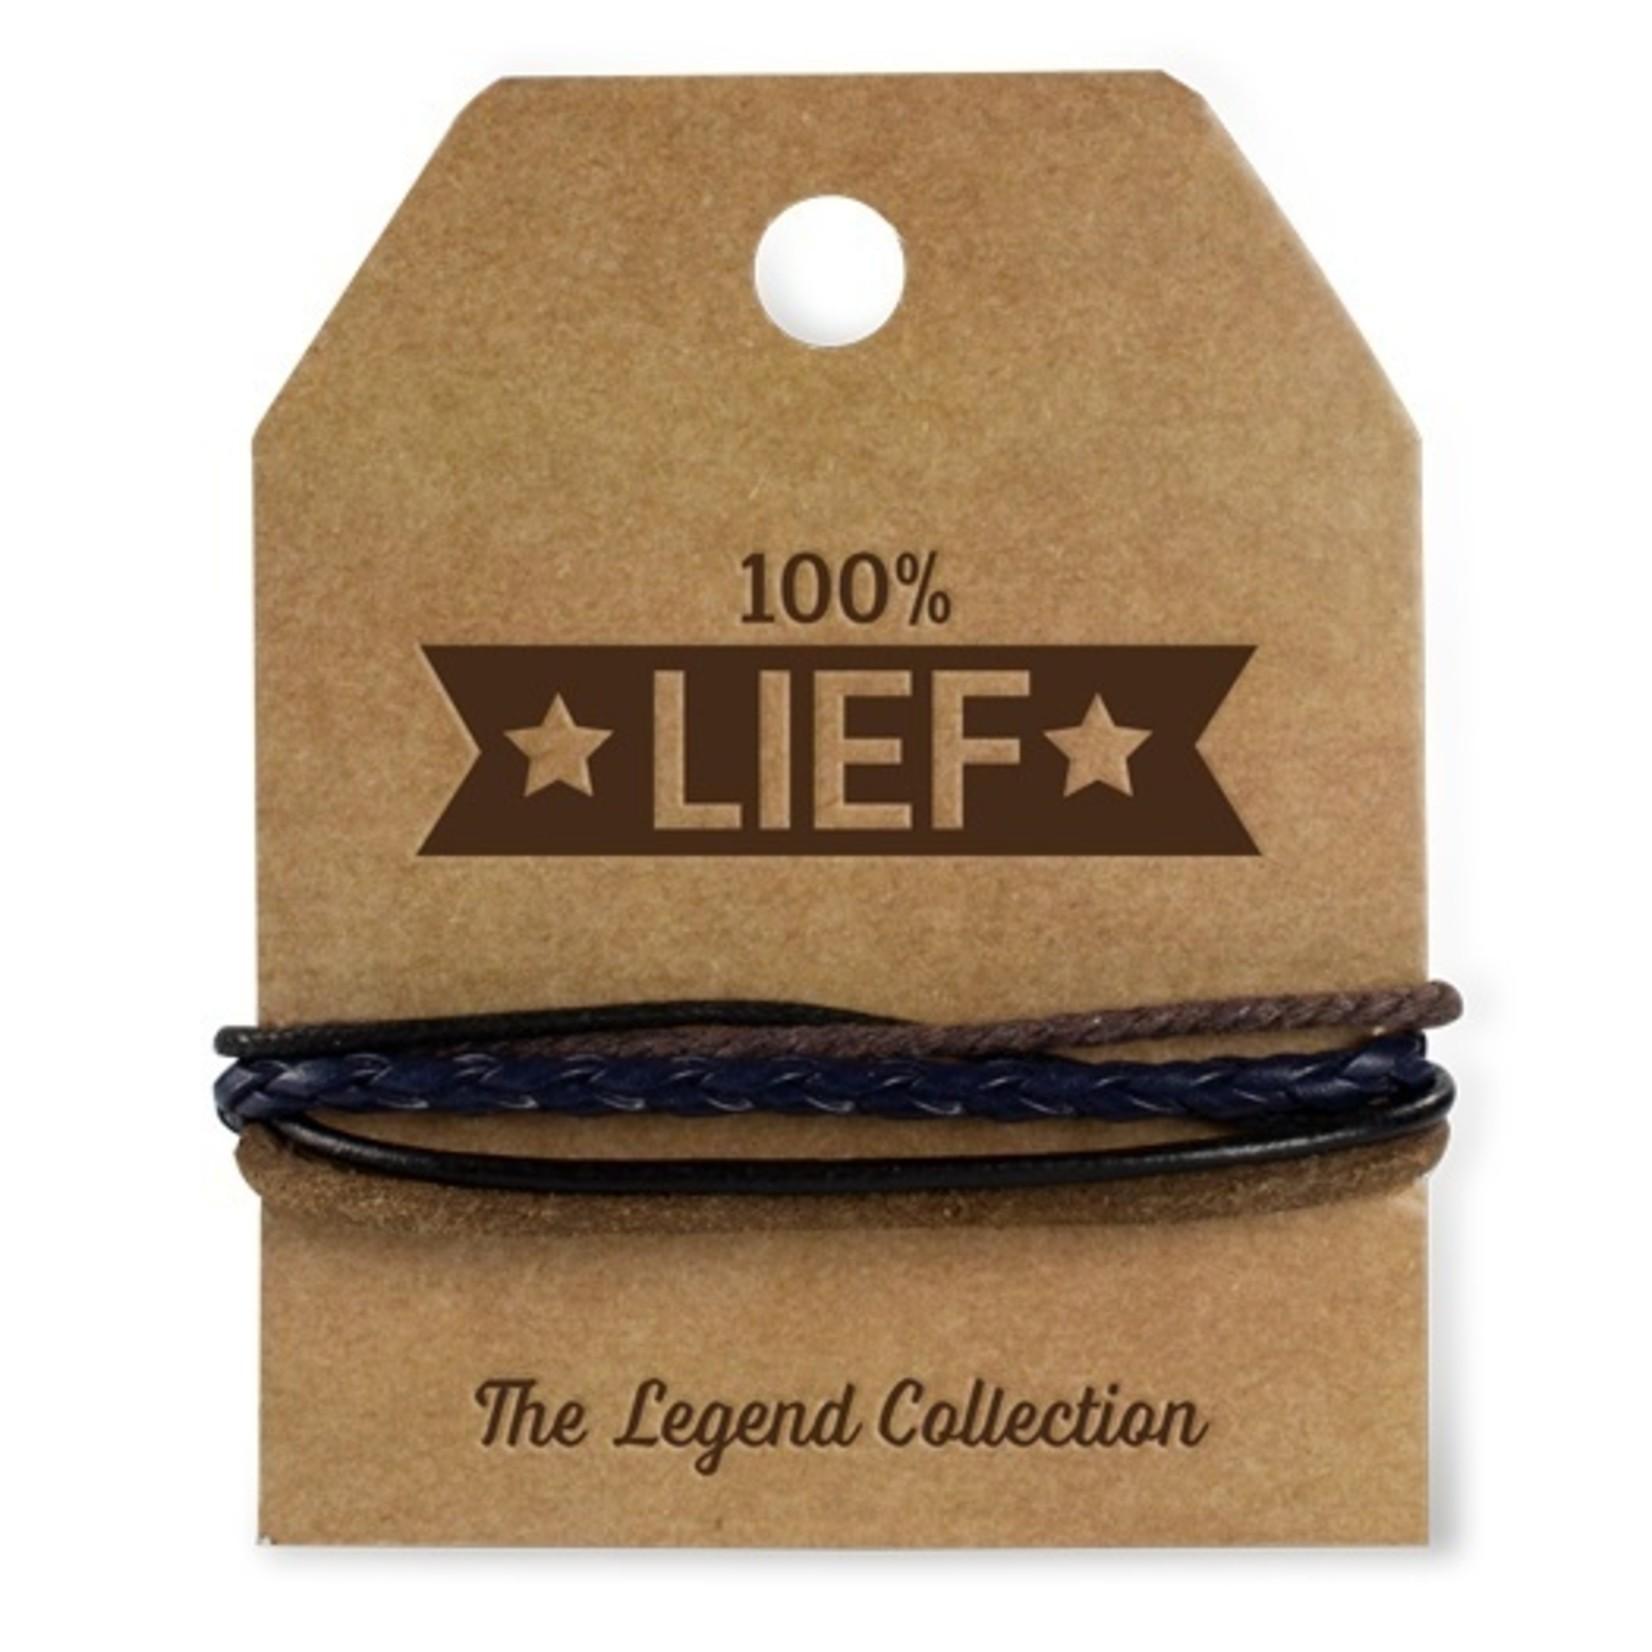 Miko Armband Legend 100% Lief